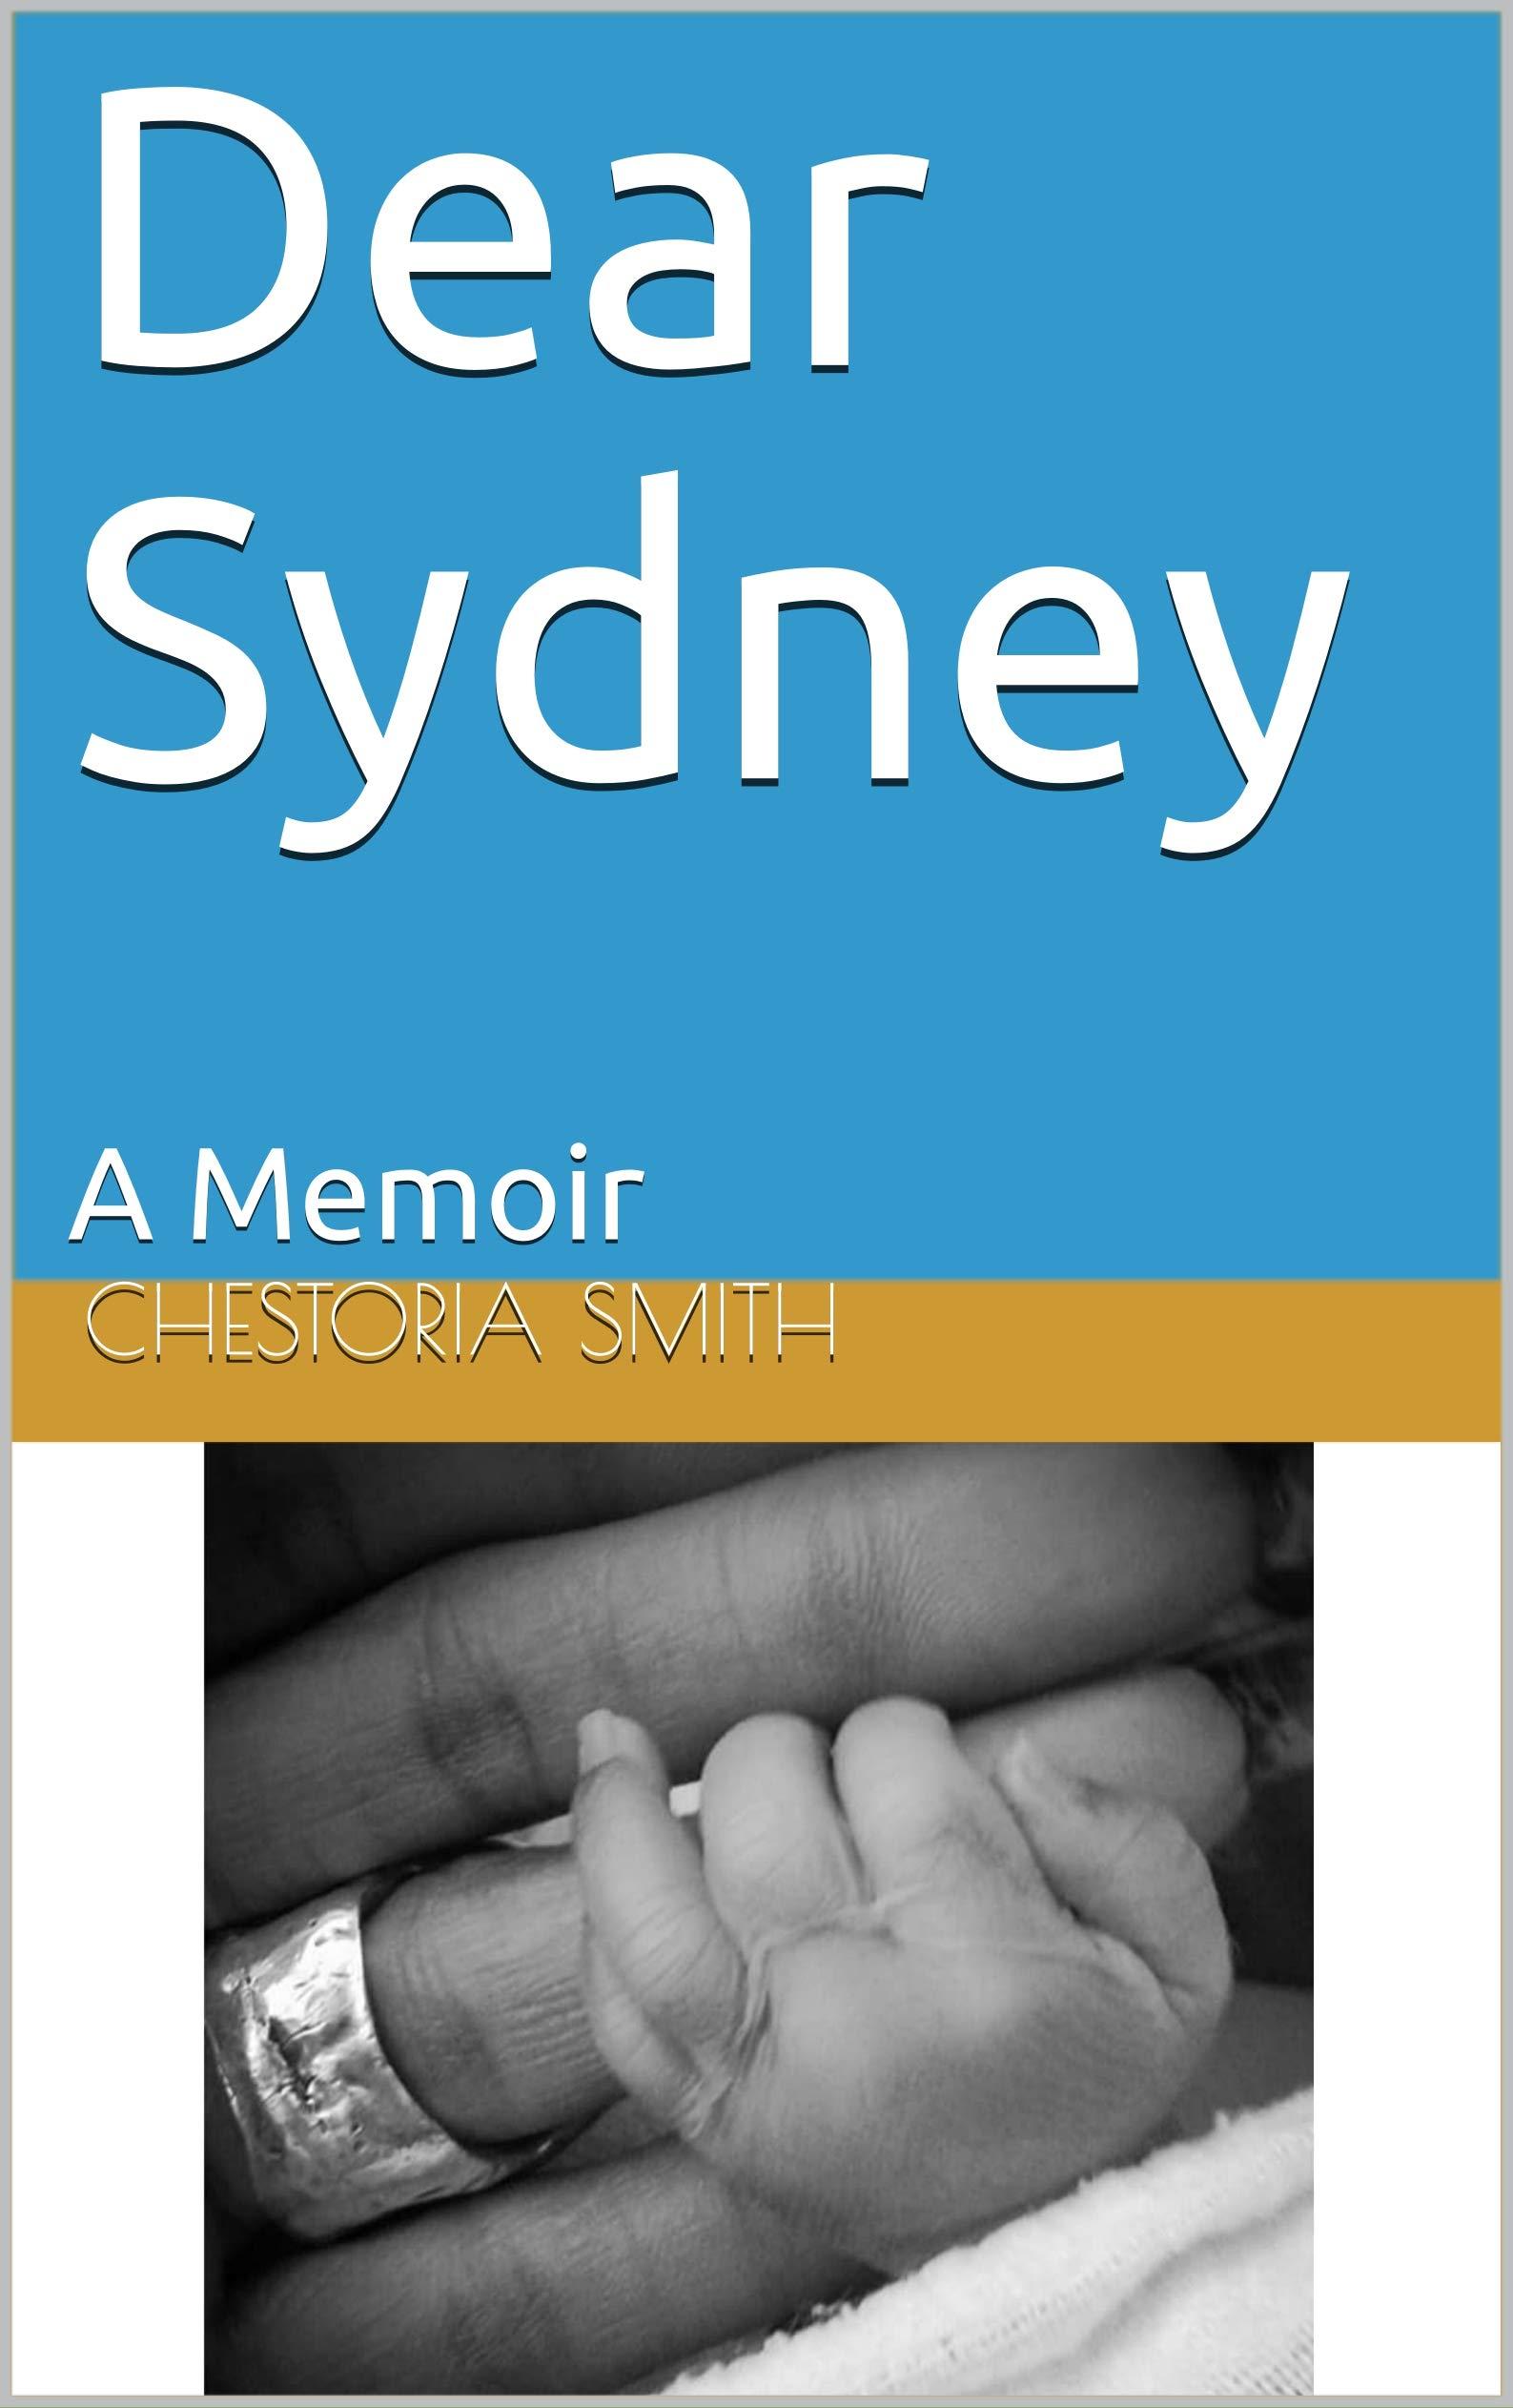 Dear Sydney: A Memoir